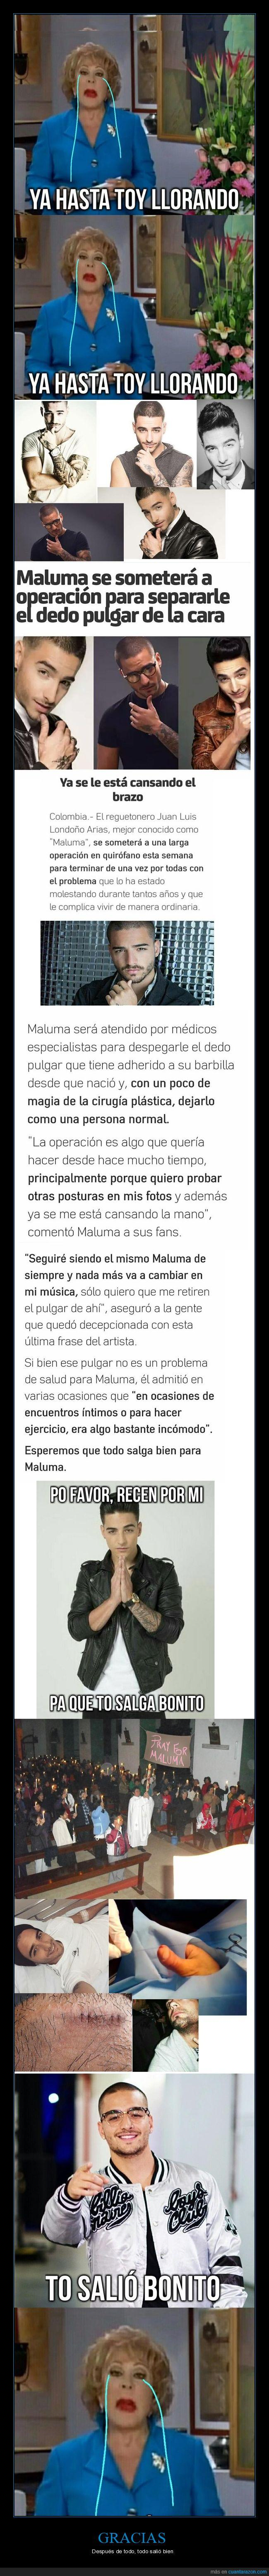 dedos,Triste historia con Maluma